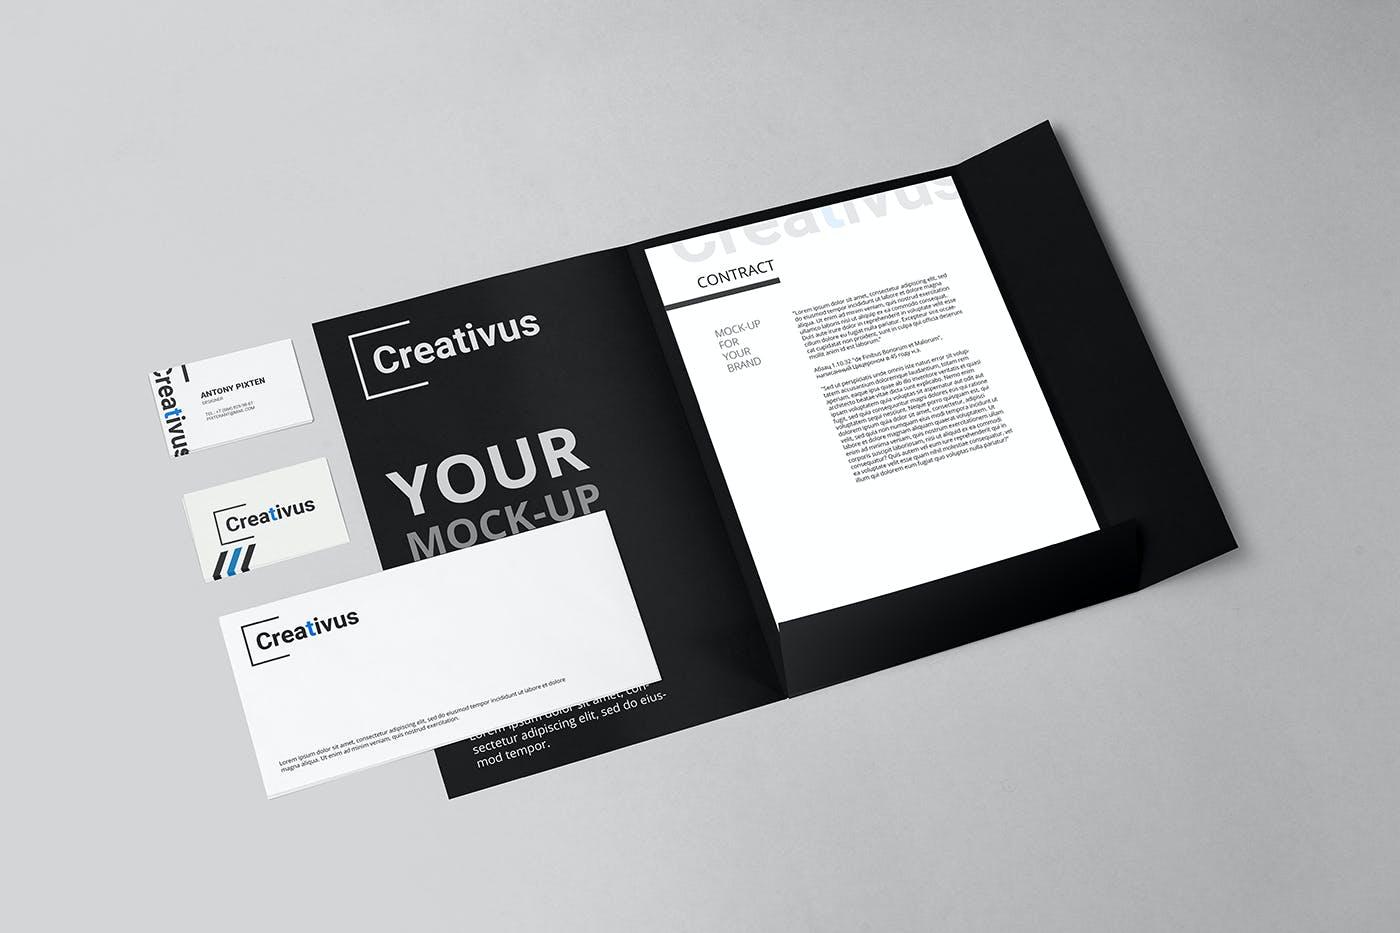 7款品牌LOGO设计办公用品展示贴图样机 Branding Stationery Mockup插图(6)